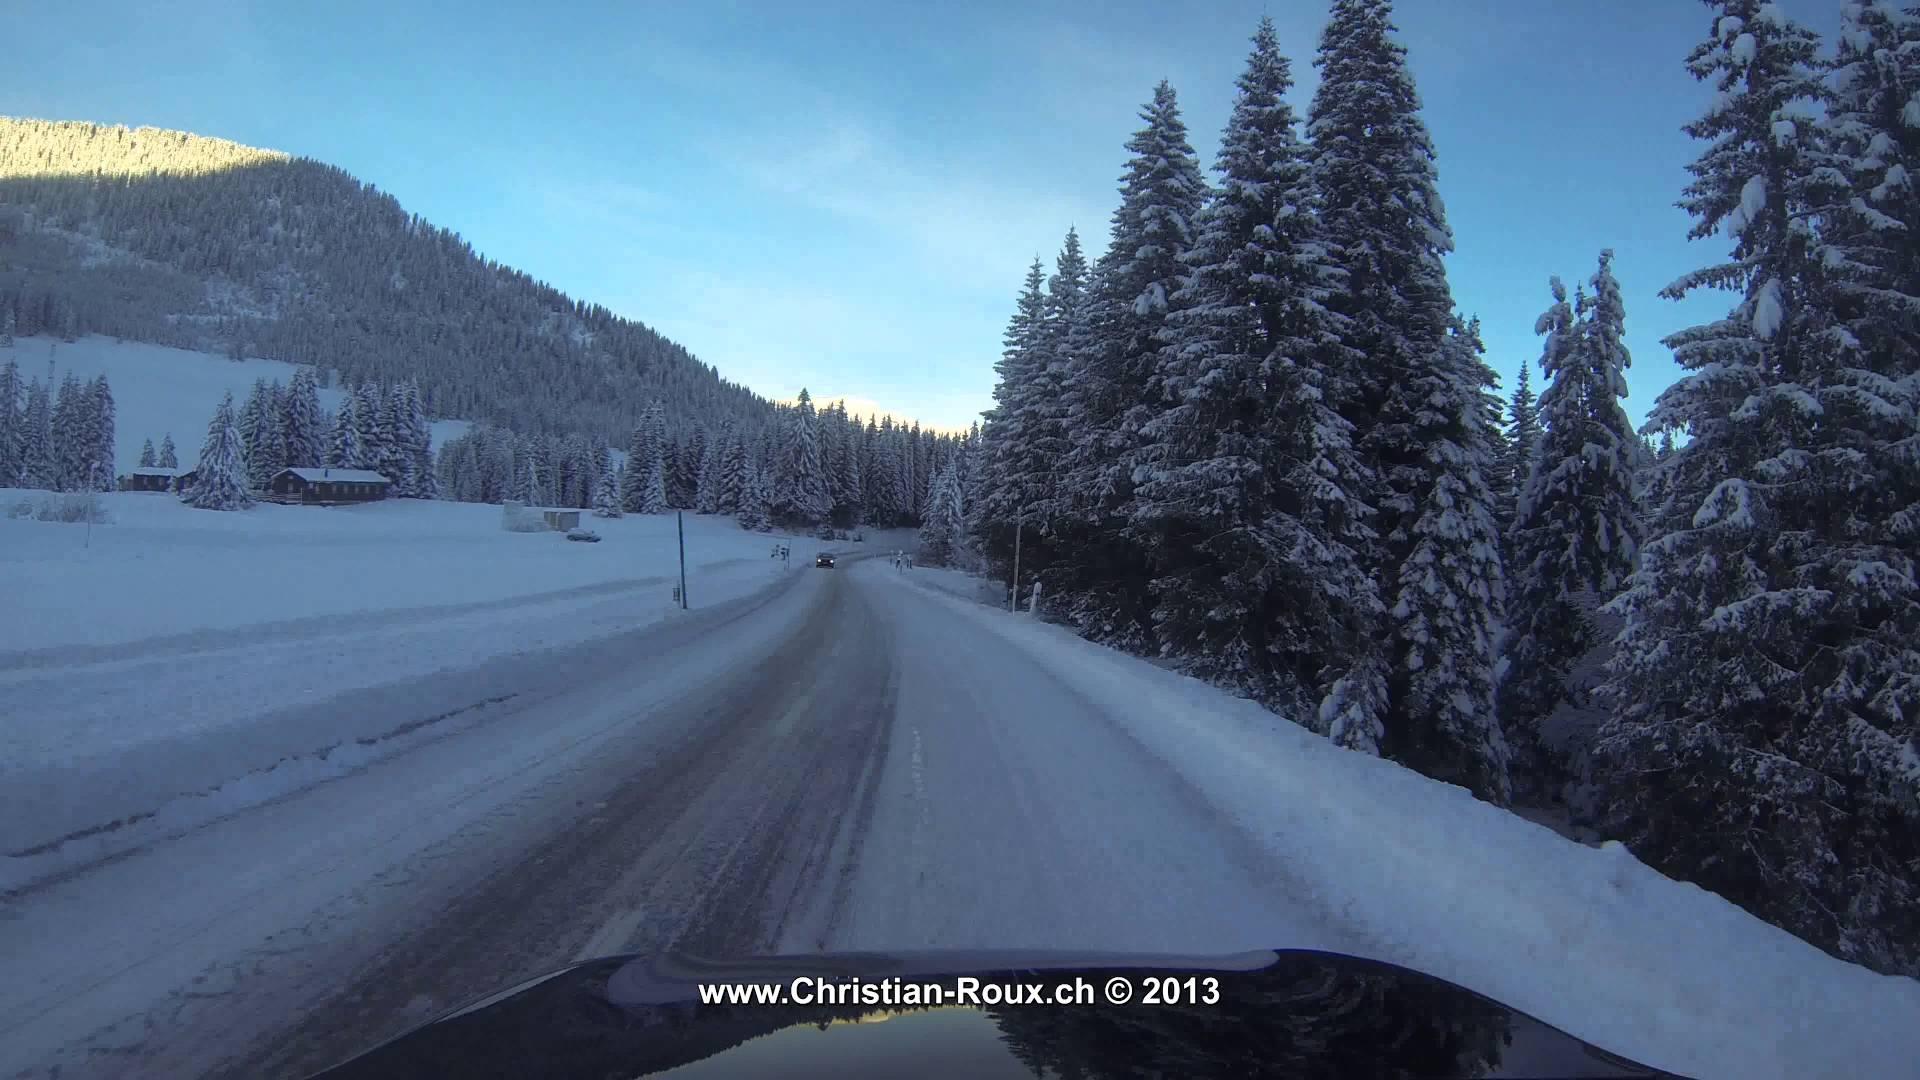 UHD/4K ☼ Switzerland 259 (Camera on board): Col des Mosses in Winter (GoPro Hero3)